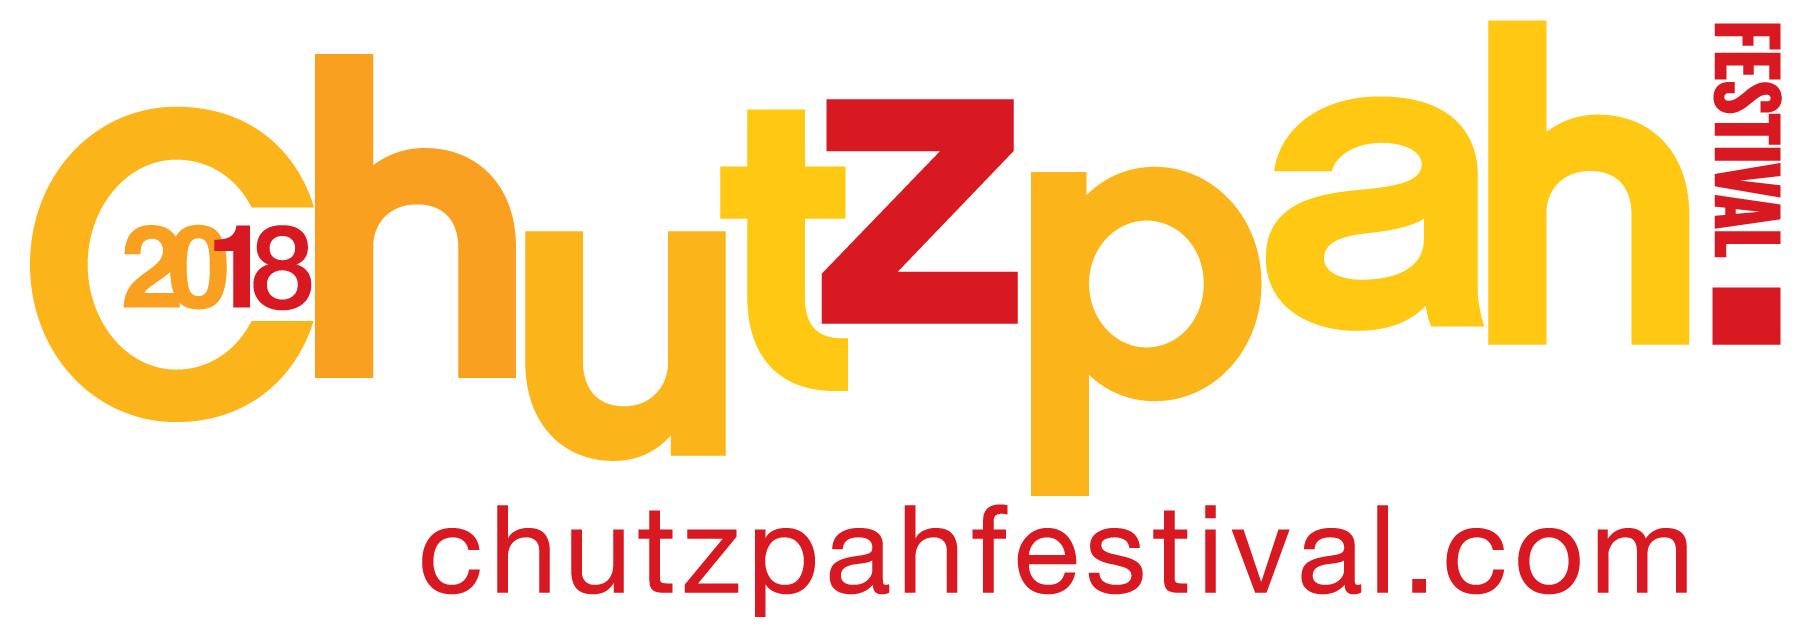 Chutzpah2018 Logo Website 300dpi.jpg